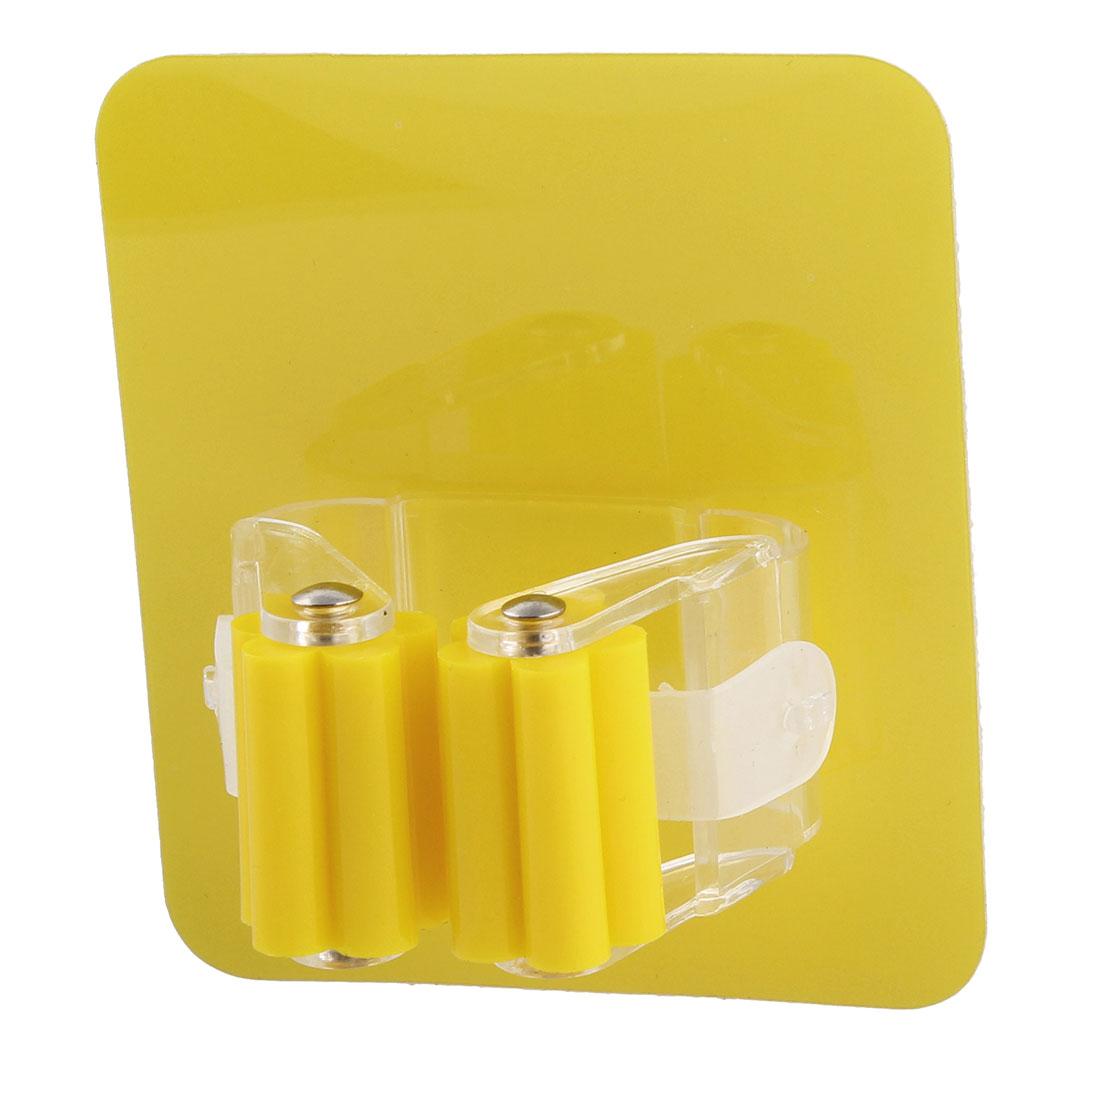 Bathroom Plastic Wall Mount Self-adhesive Broom Mop Storage Holder Clip Hook